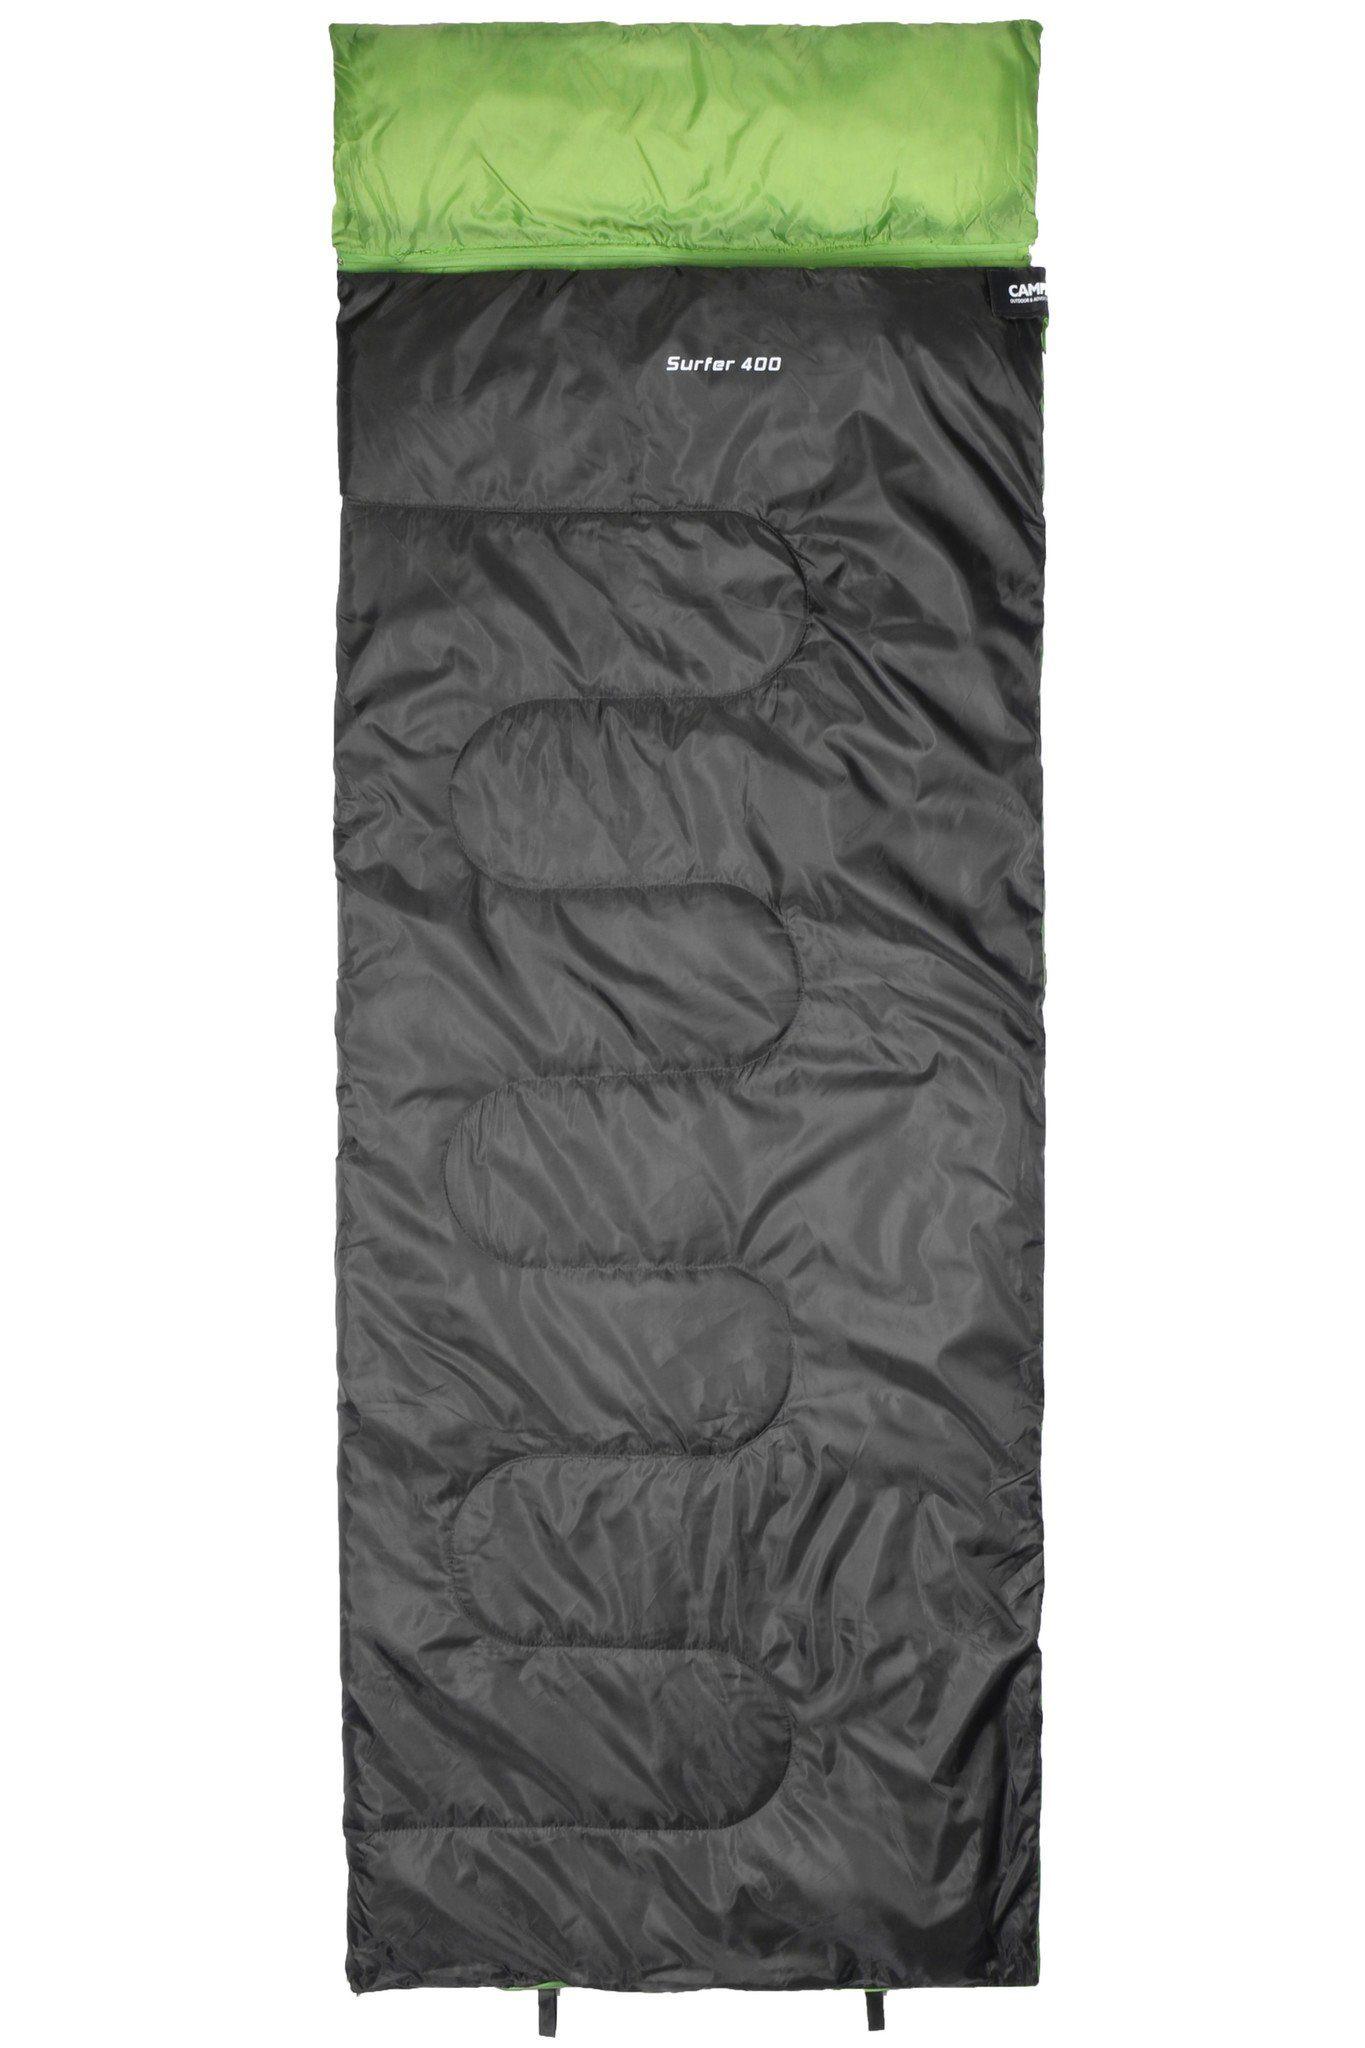 Outwell Commodore Sleeping Bag Ausf/ührung Right Zipper 2019 Schlafsack